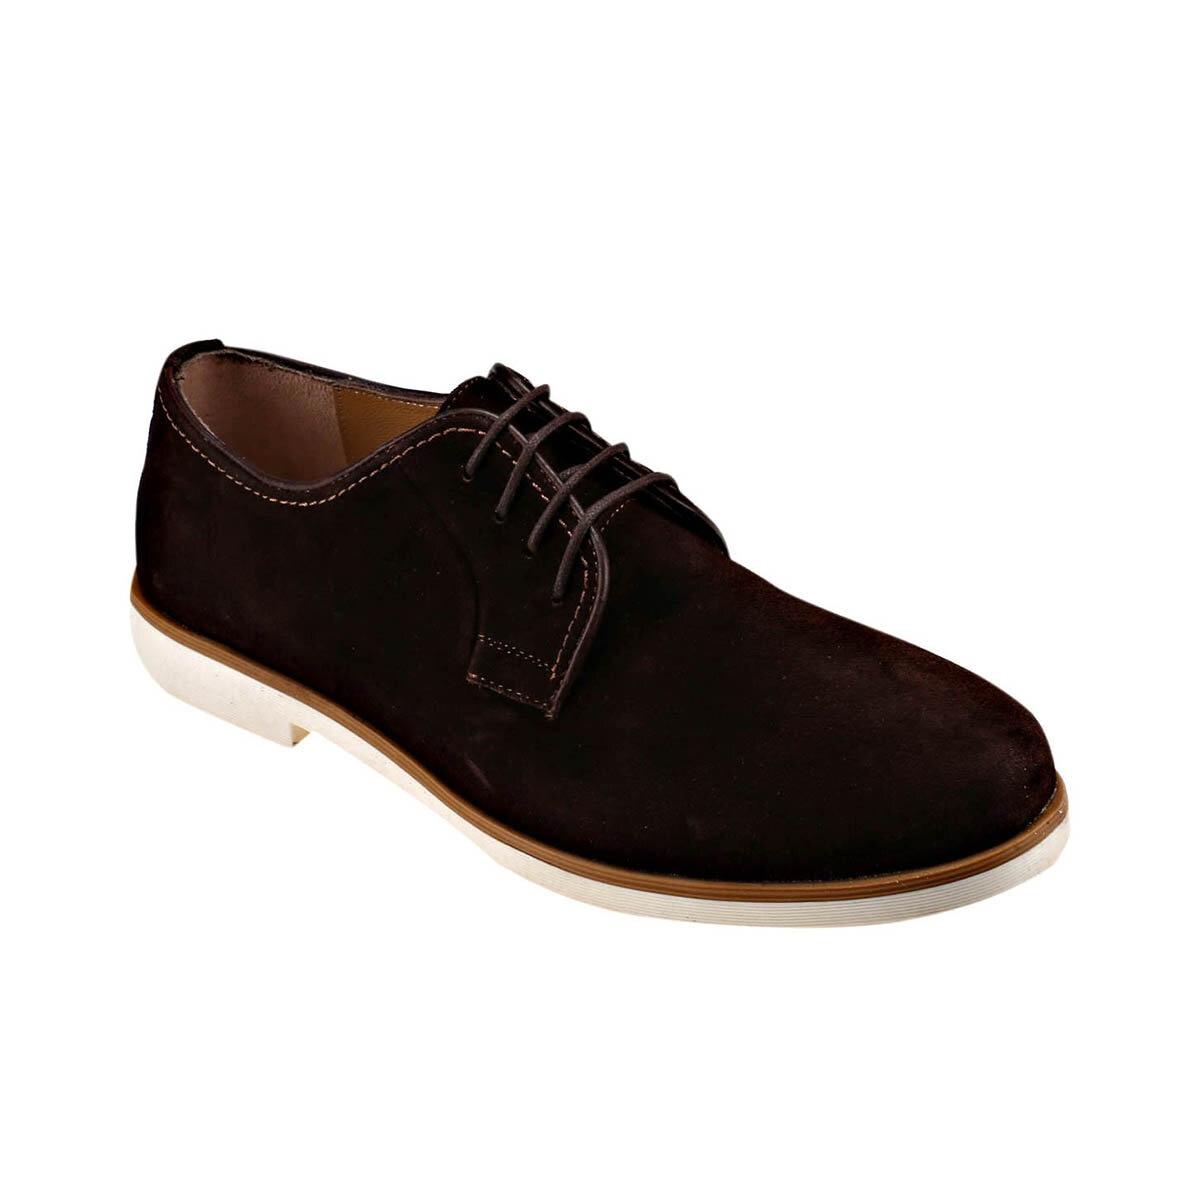 FLO KL-51153-1 M 1506 Brown Men 'S Classic Shoes JJ-Stiller